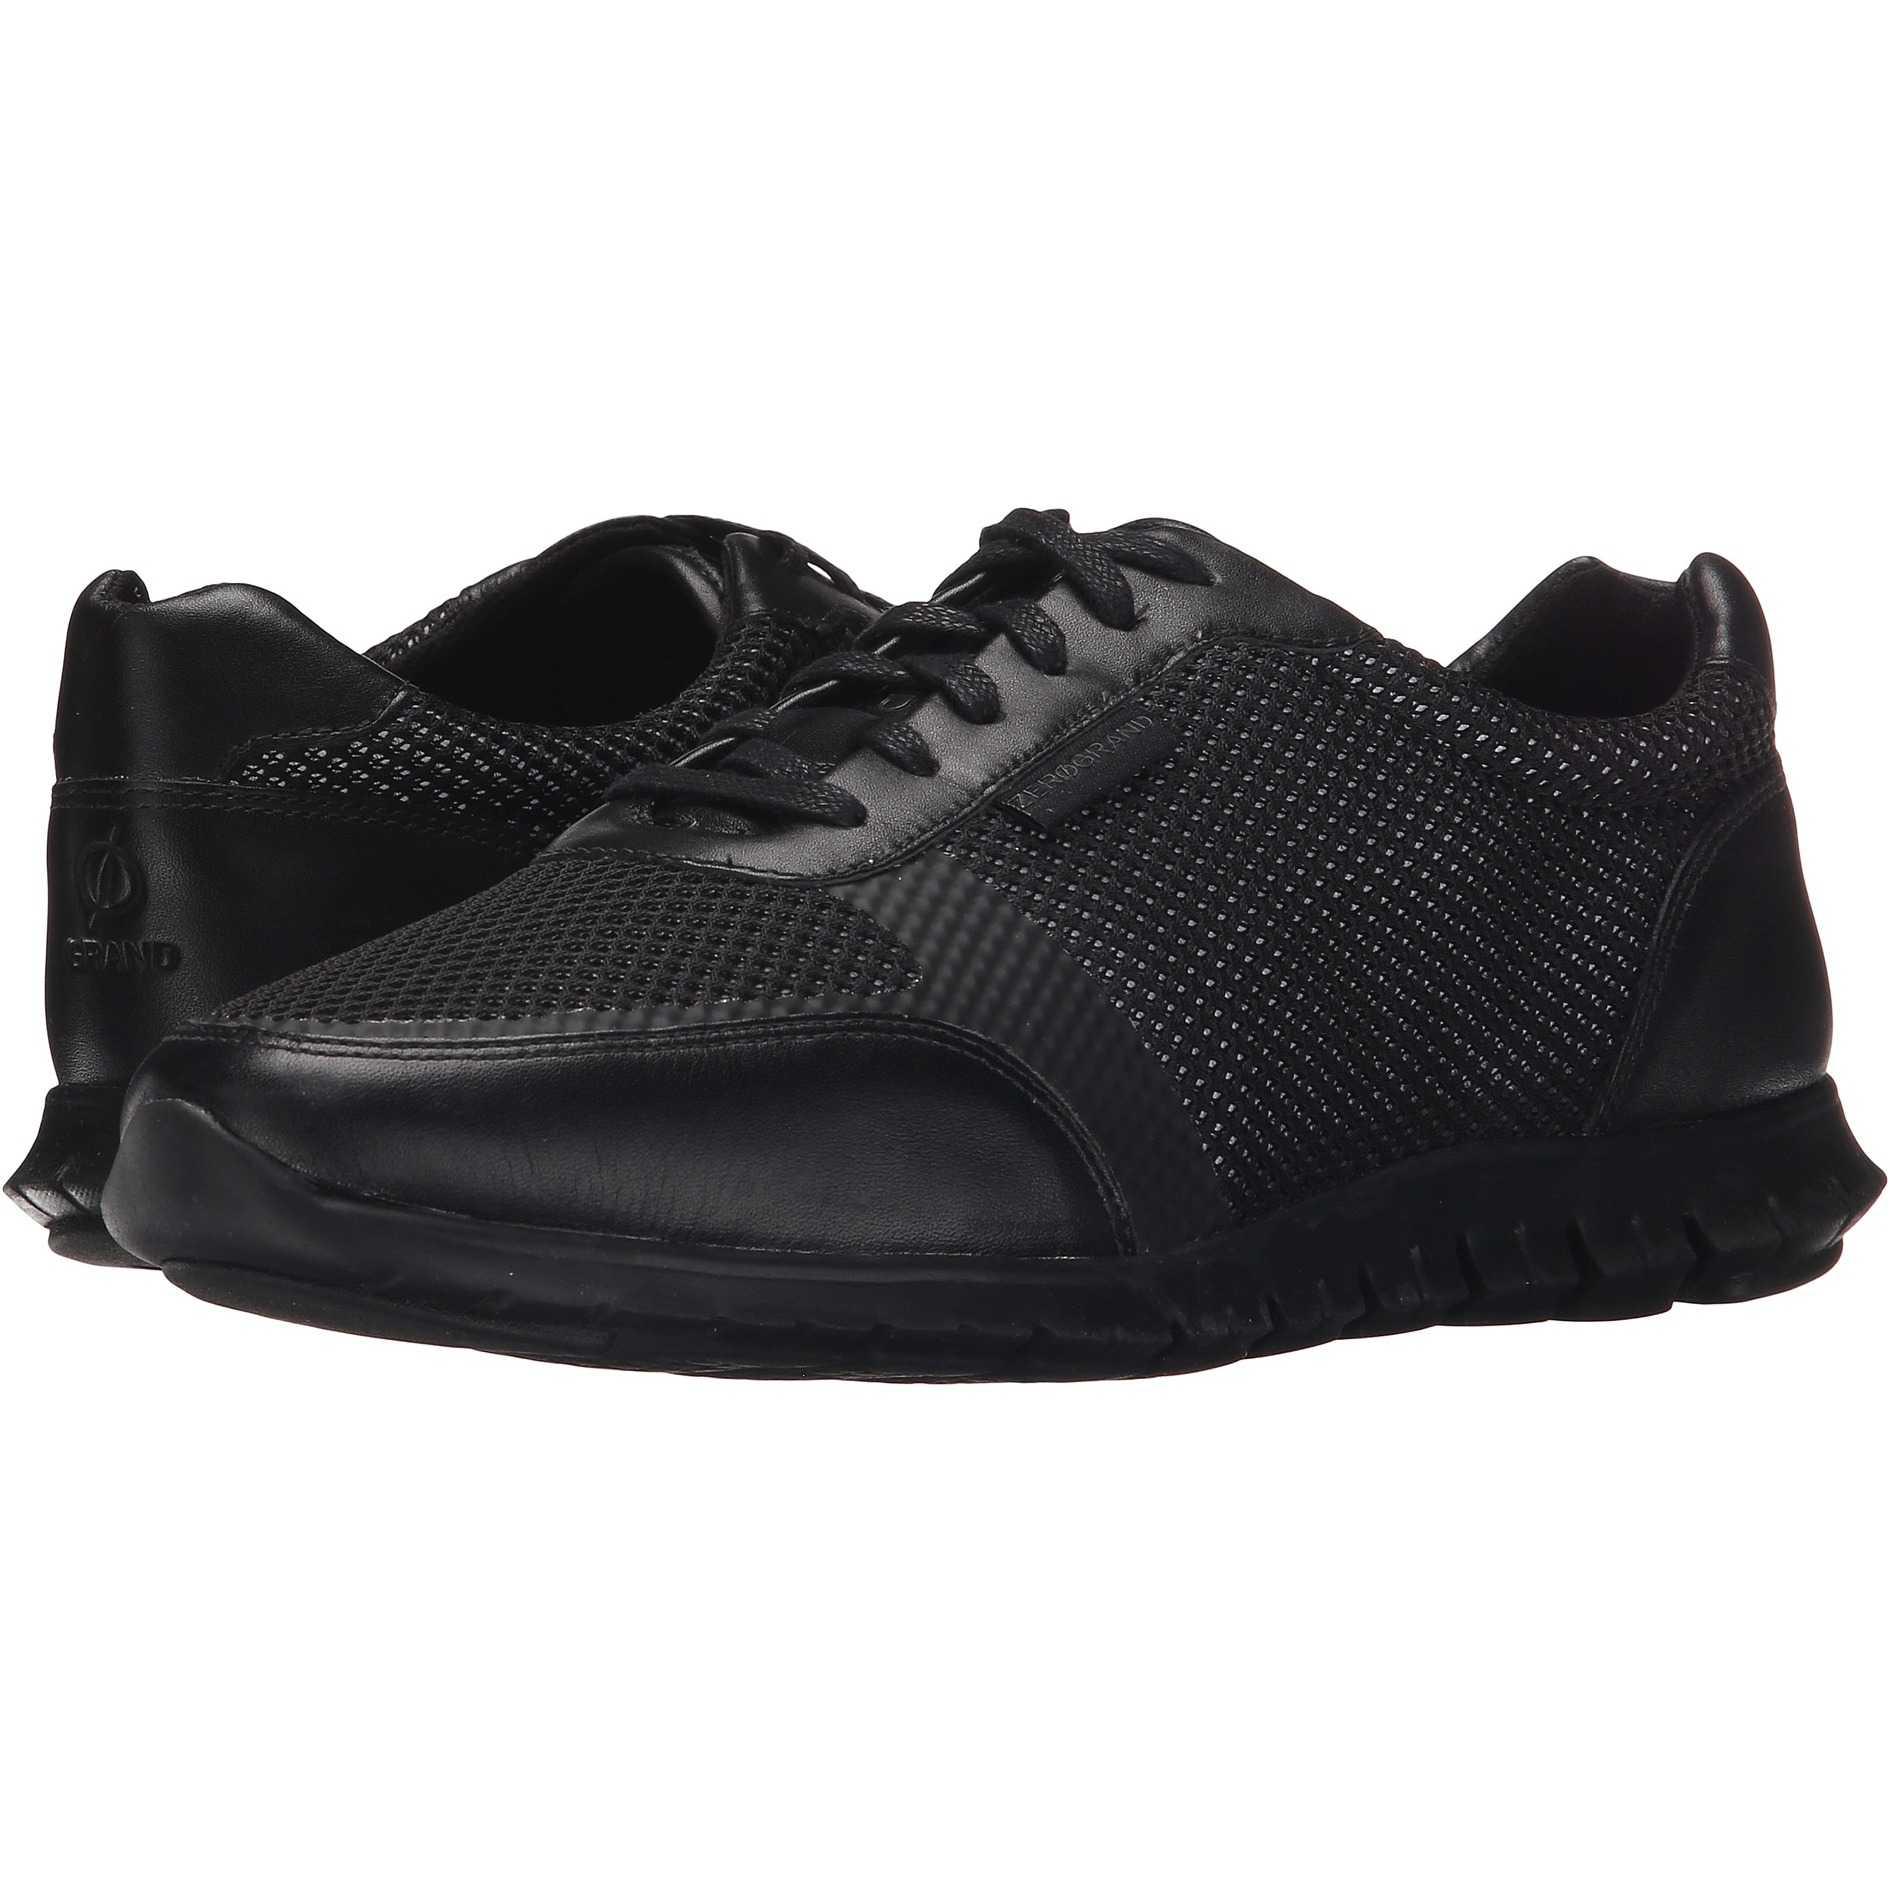 Cole Haan Zerogrand Classic Sneaker Black Reflective/Black pentru femei